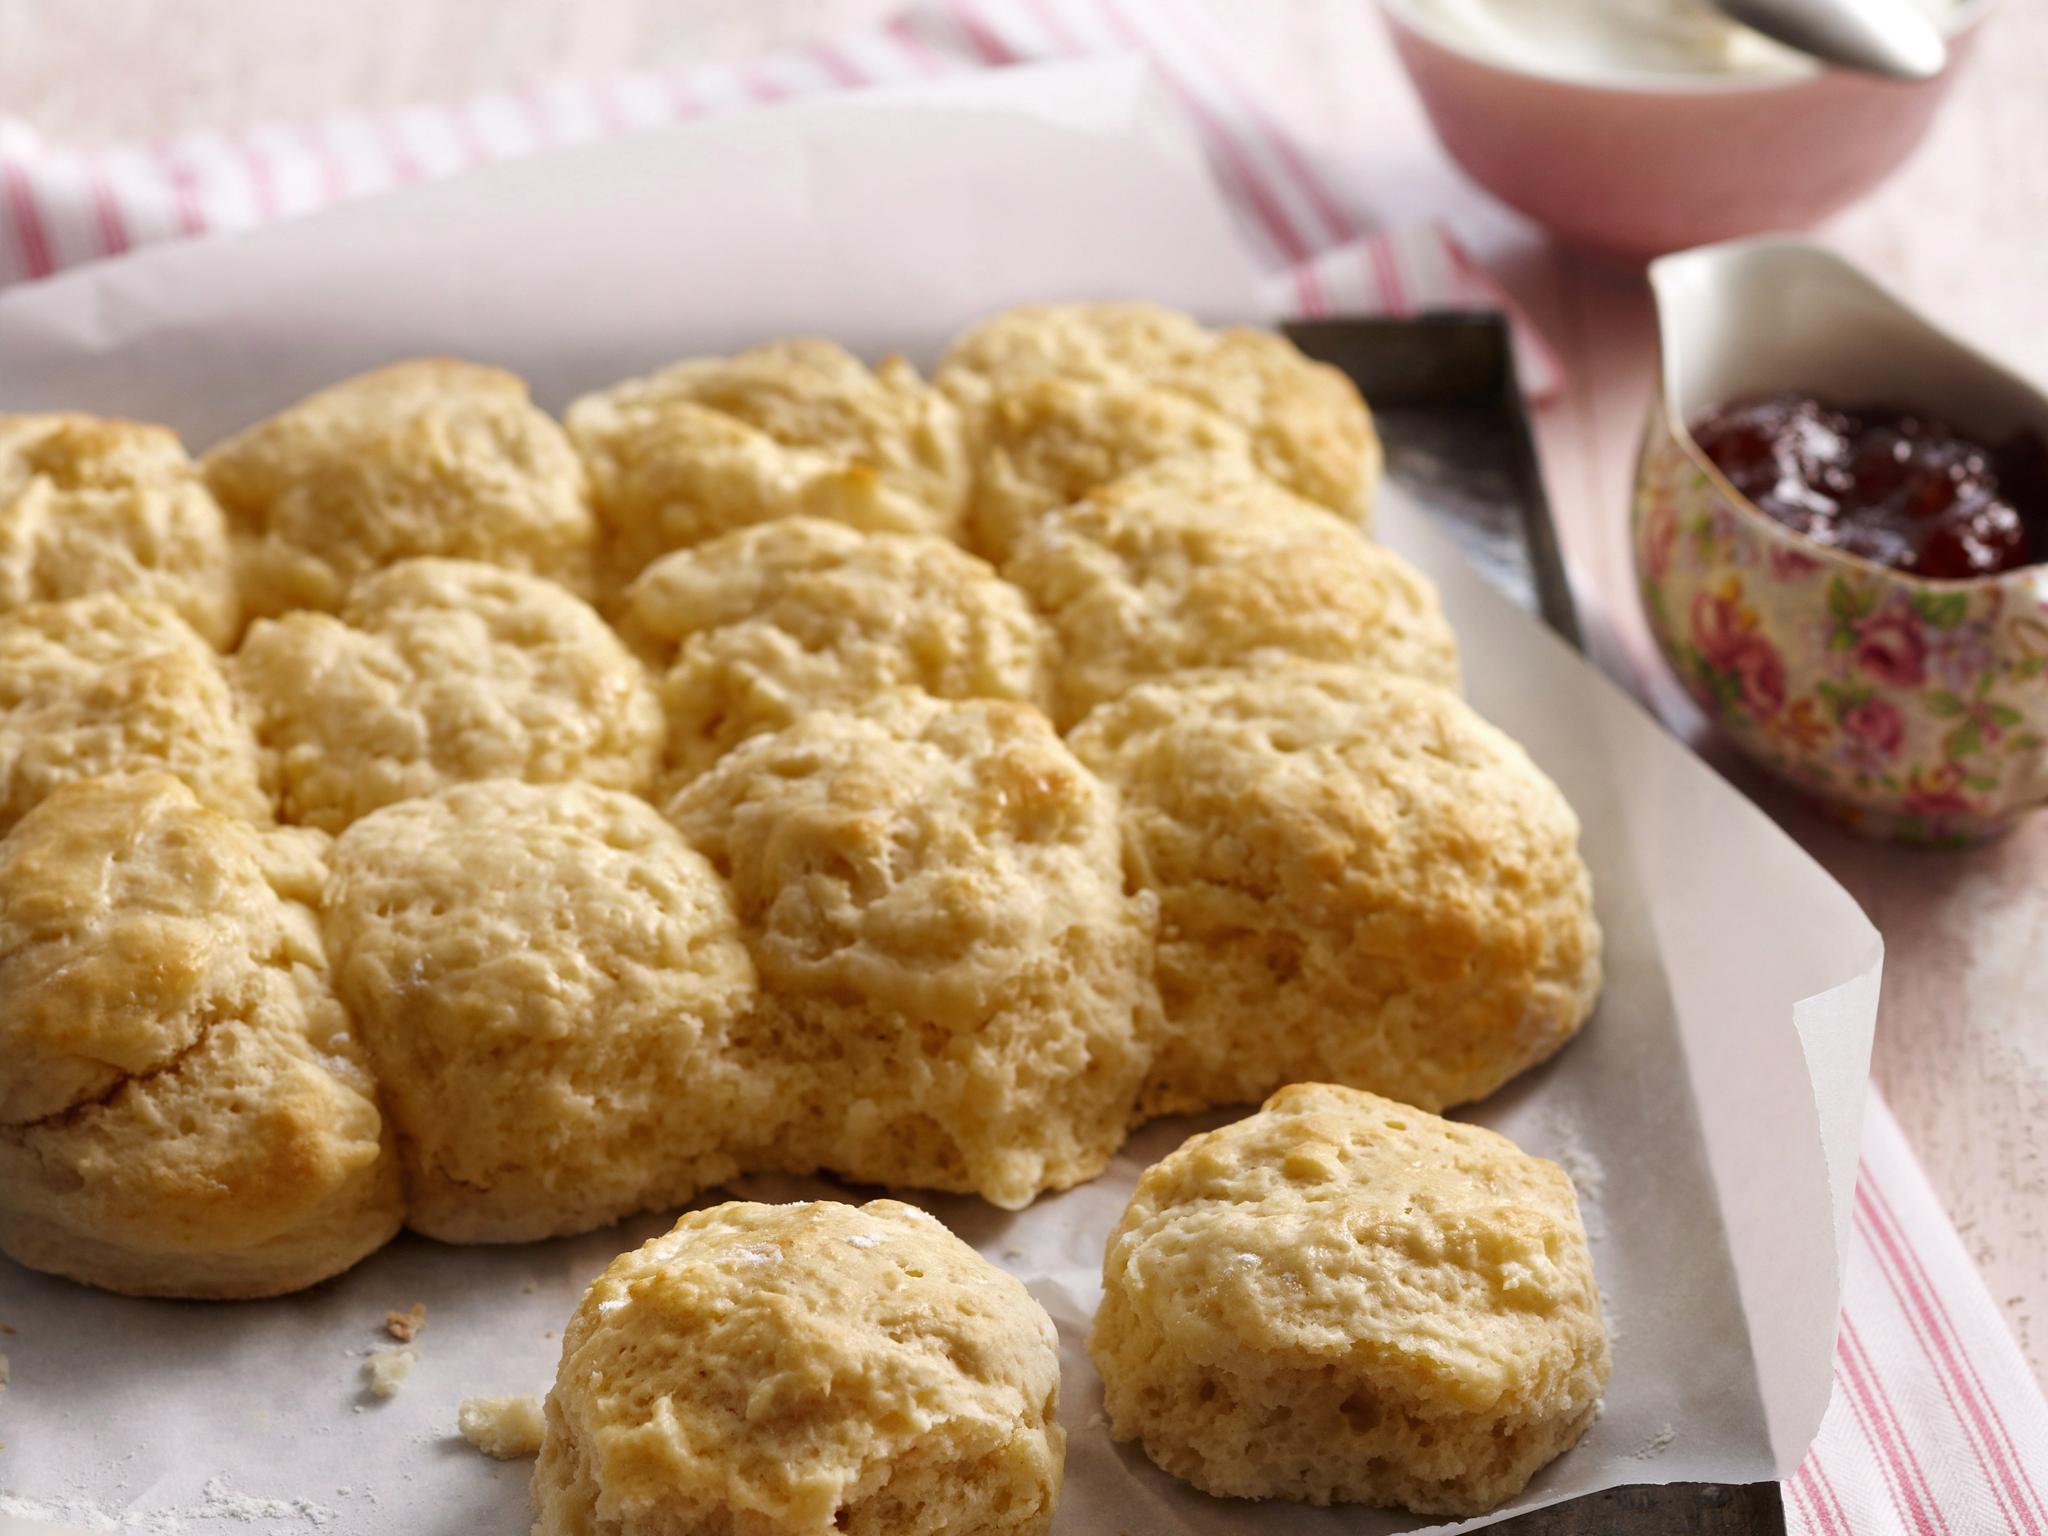 Lemonade scones